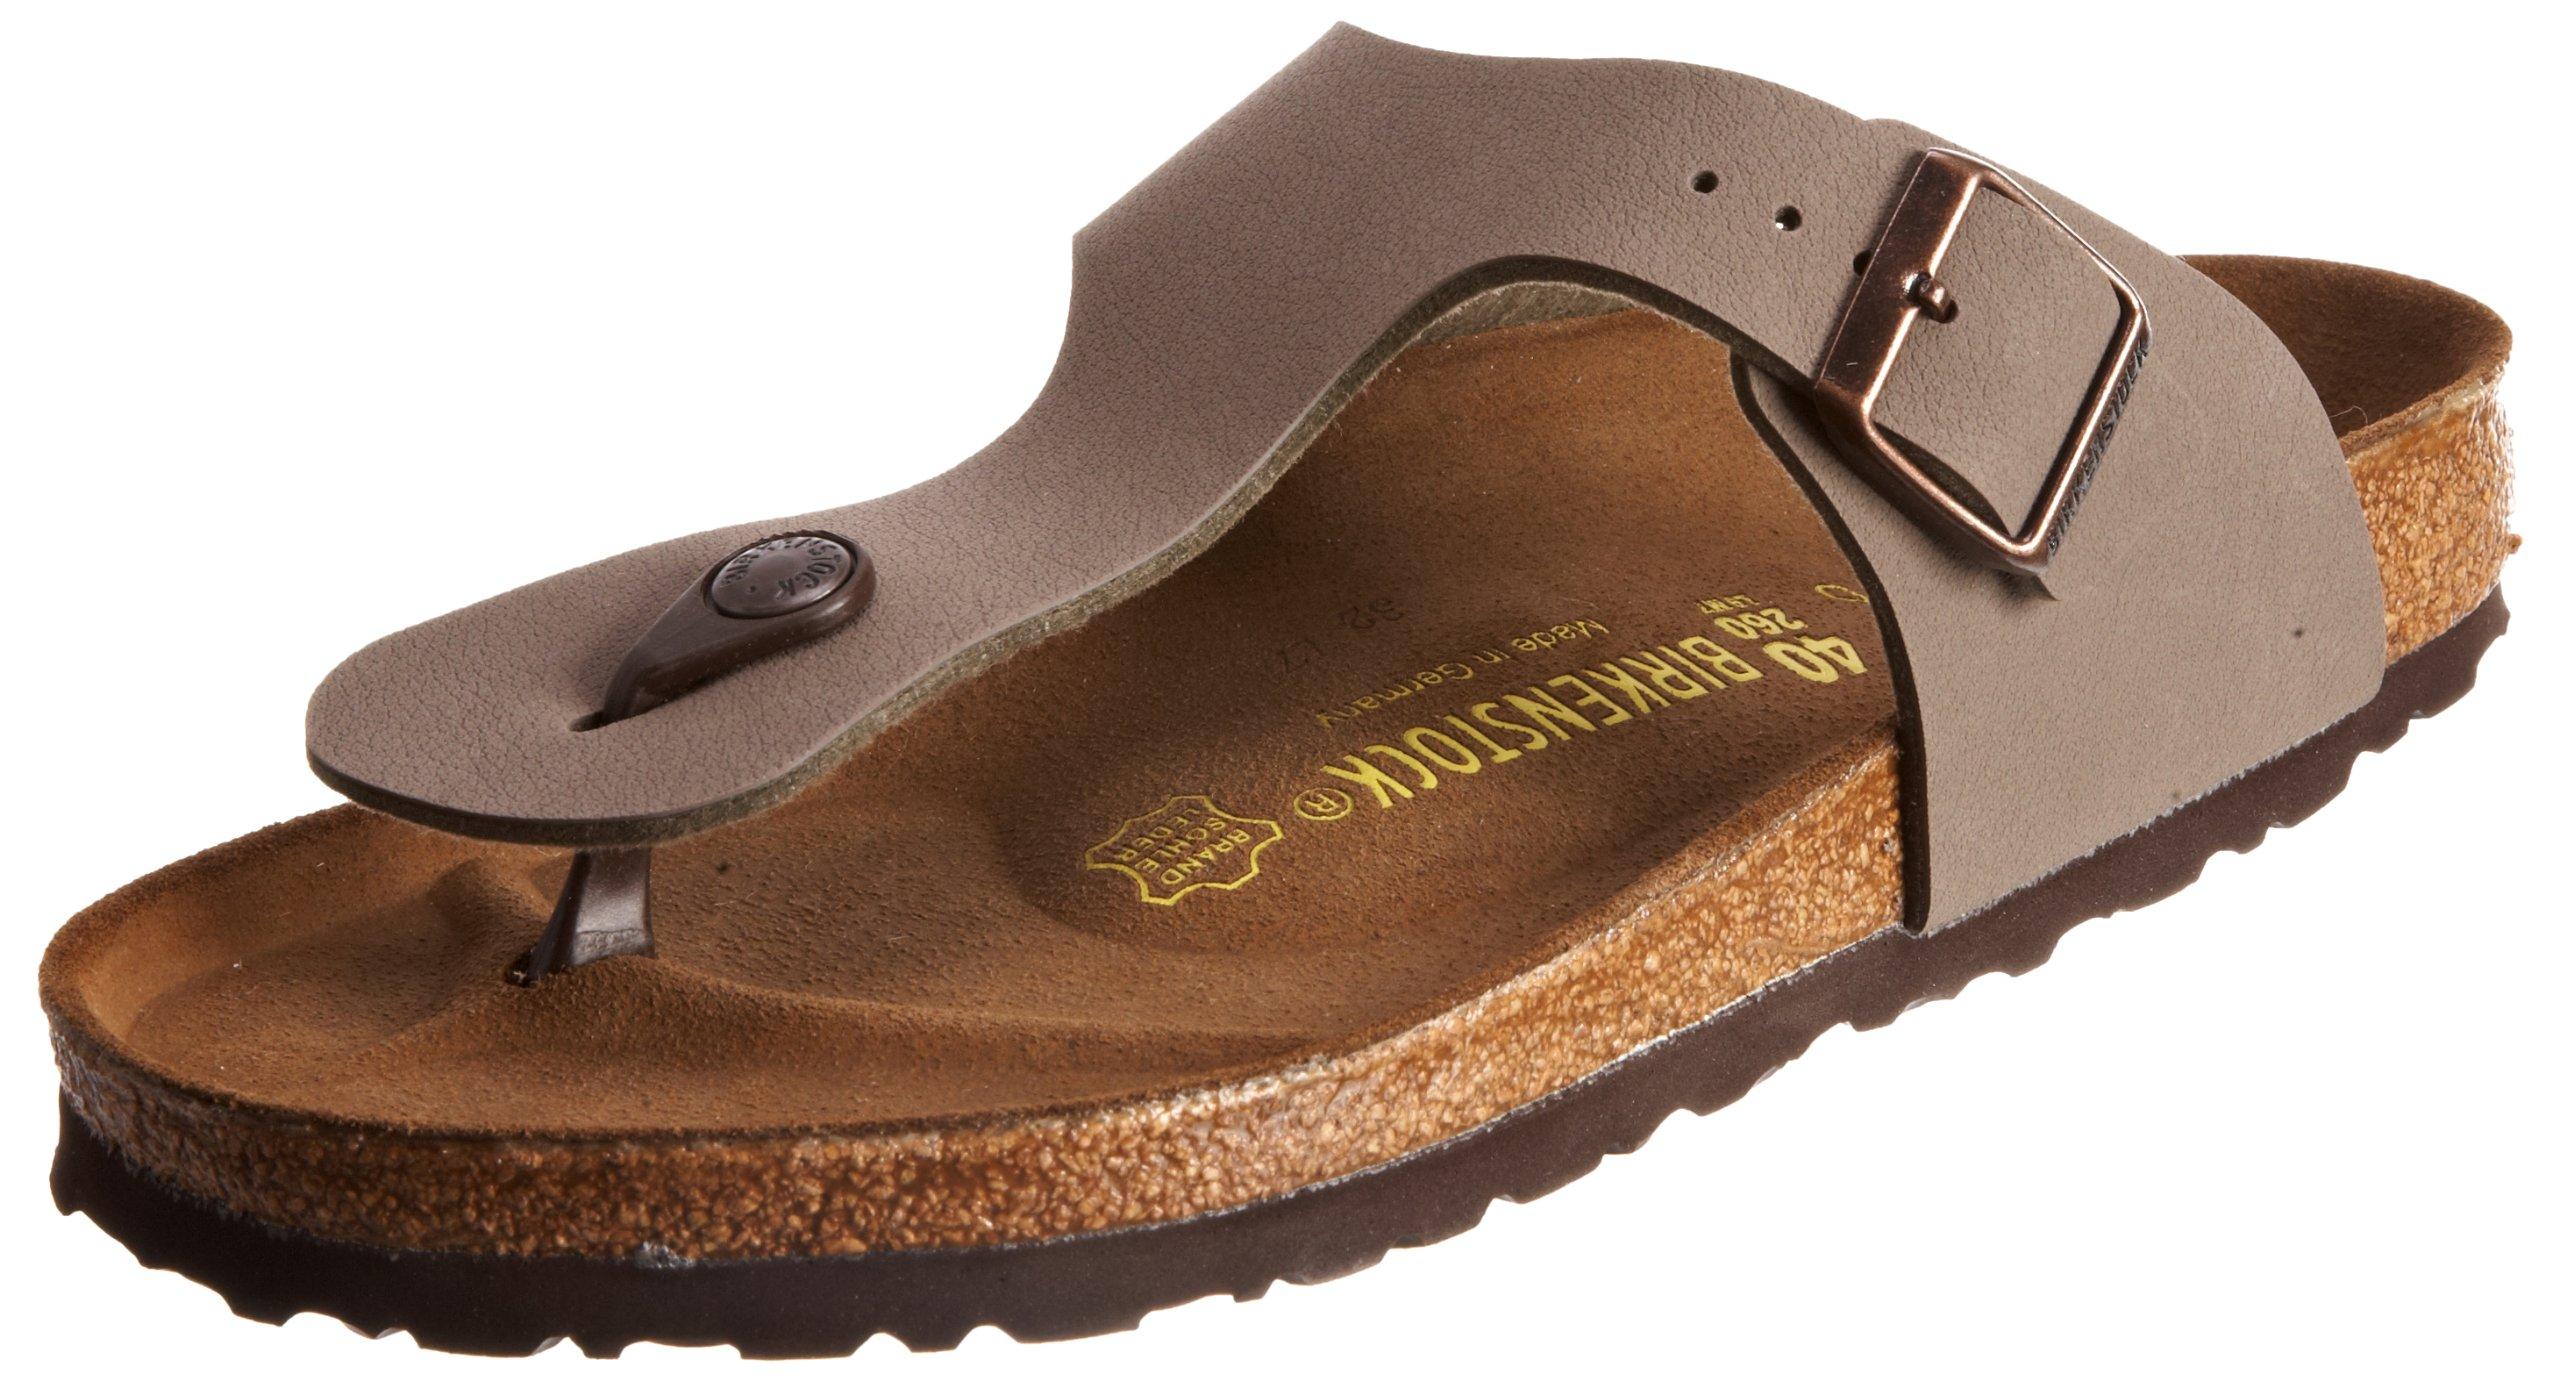 a8af6554f606 Galleon - Birkenstock Women´s Ramses Stone Birkibuc Sandals 36 M EU ...